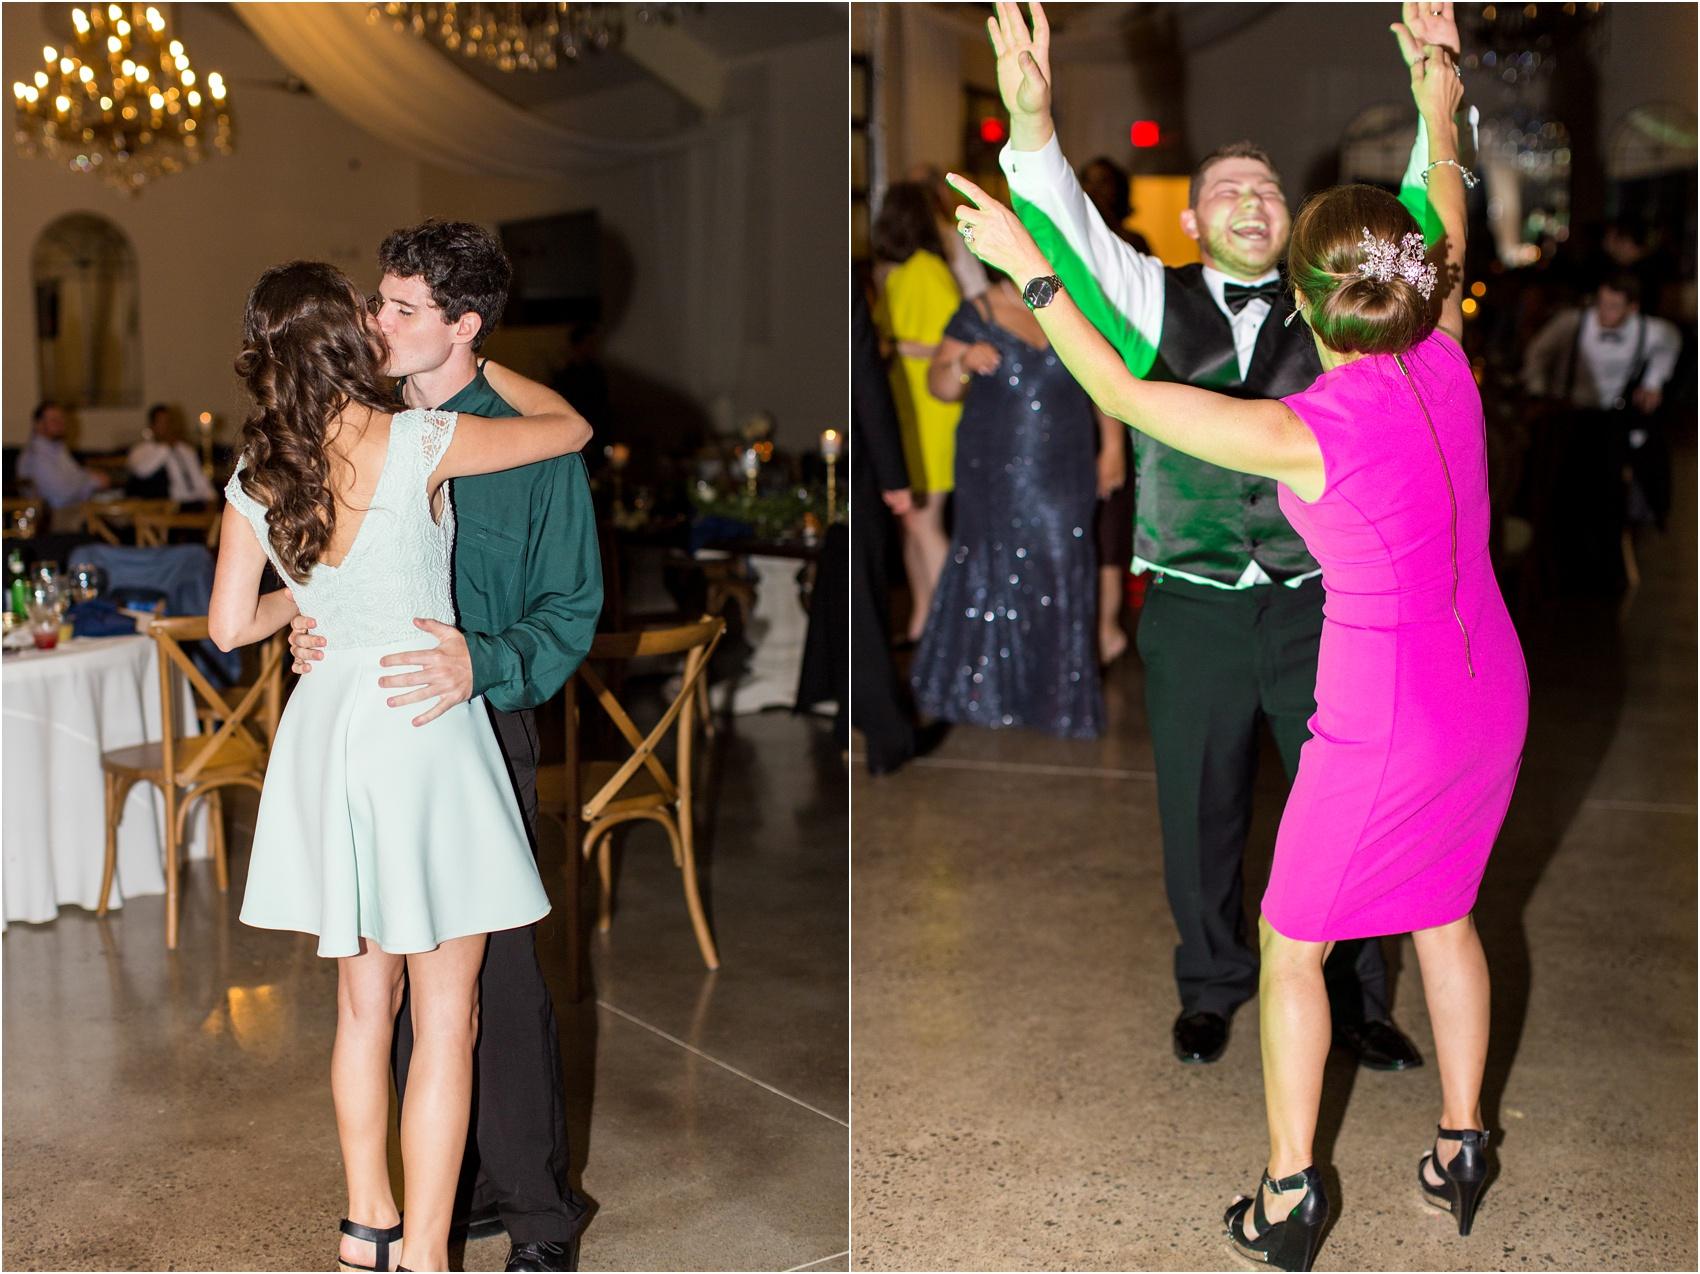 Savannah Eve Photography- Jurek-Woodworth Wedding- Sneak Peek-114.jpg